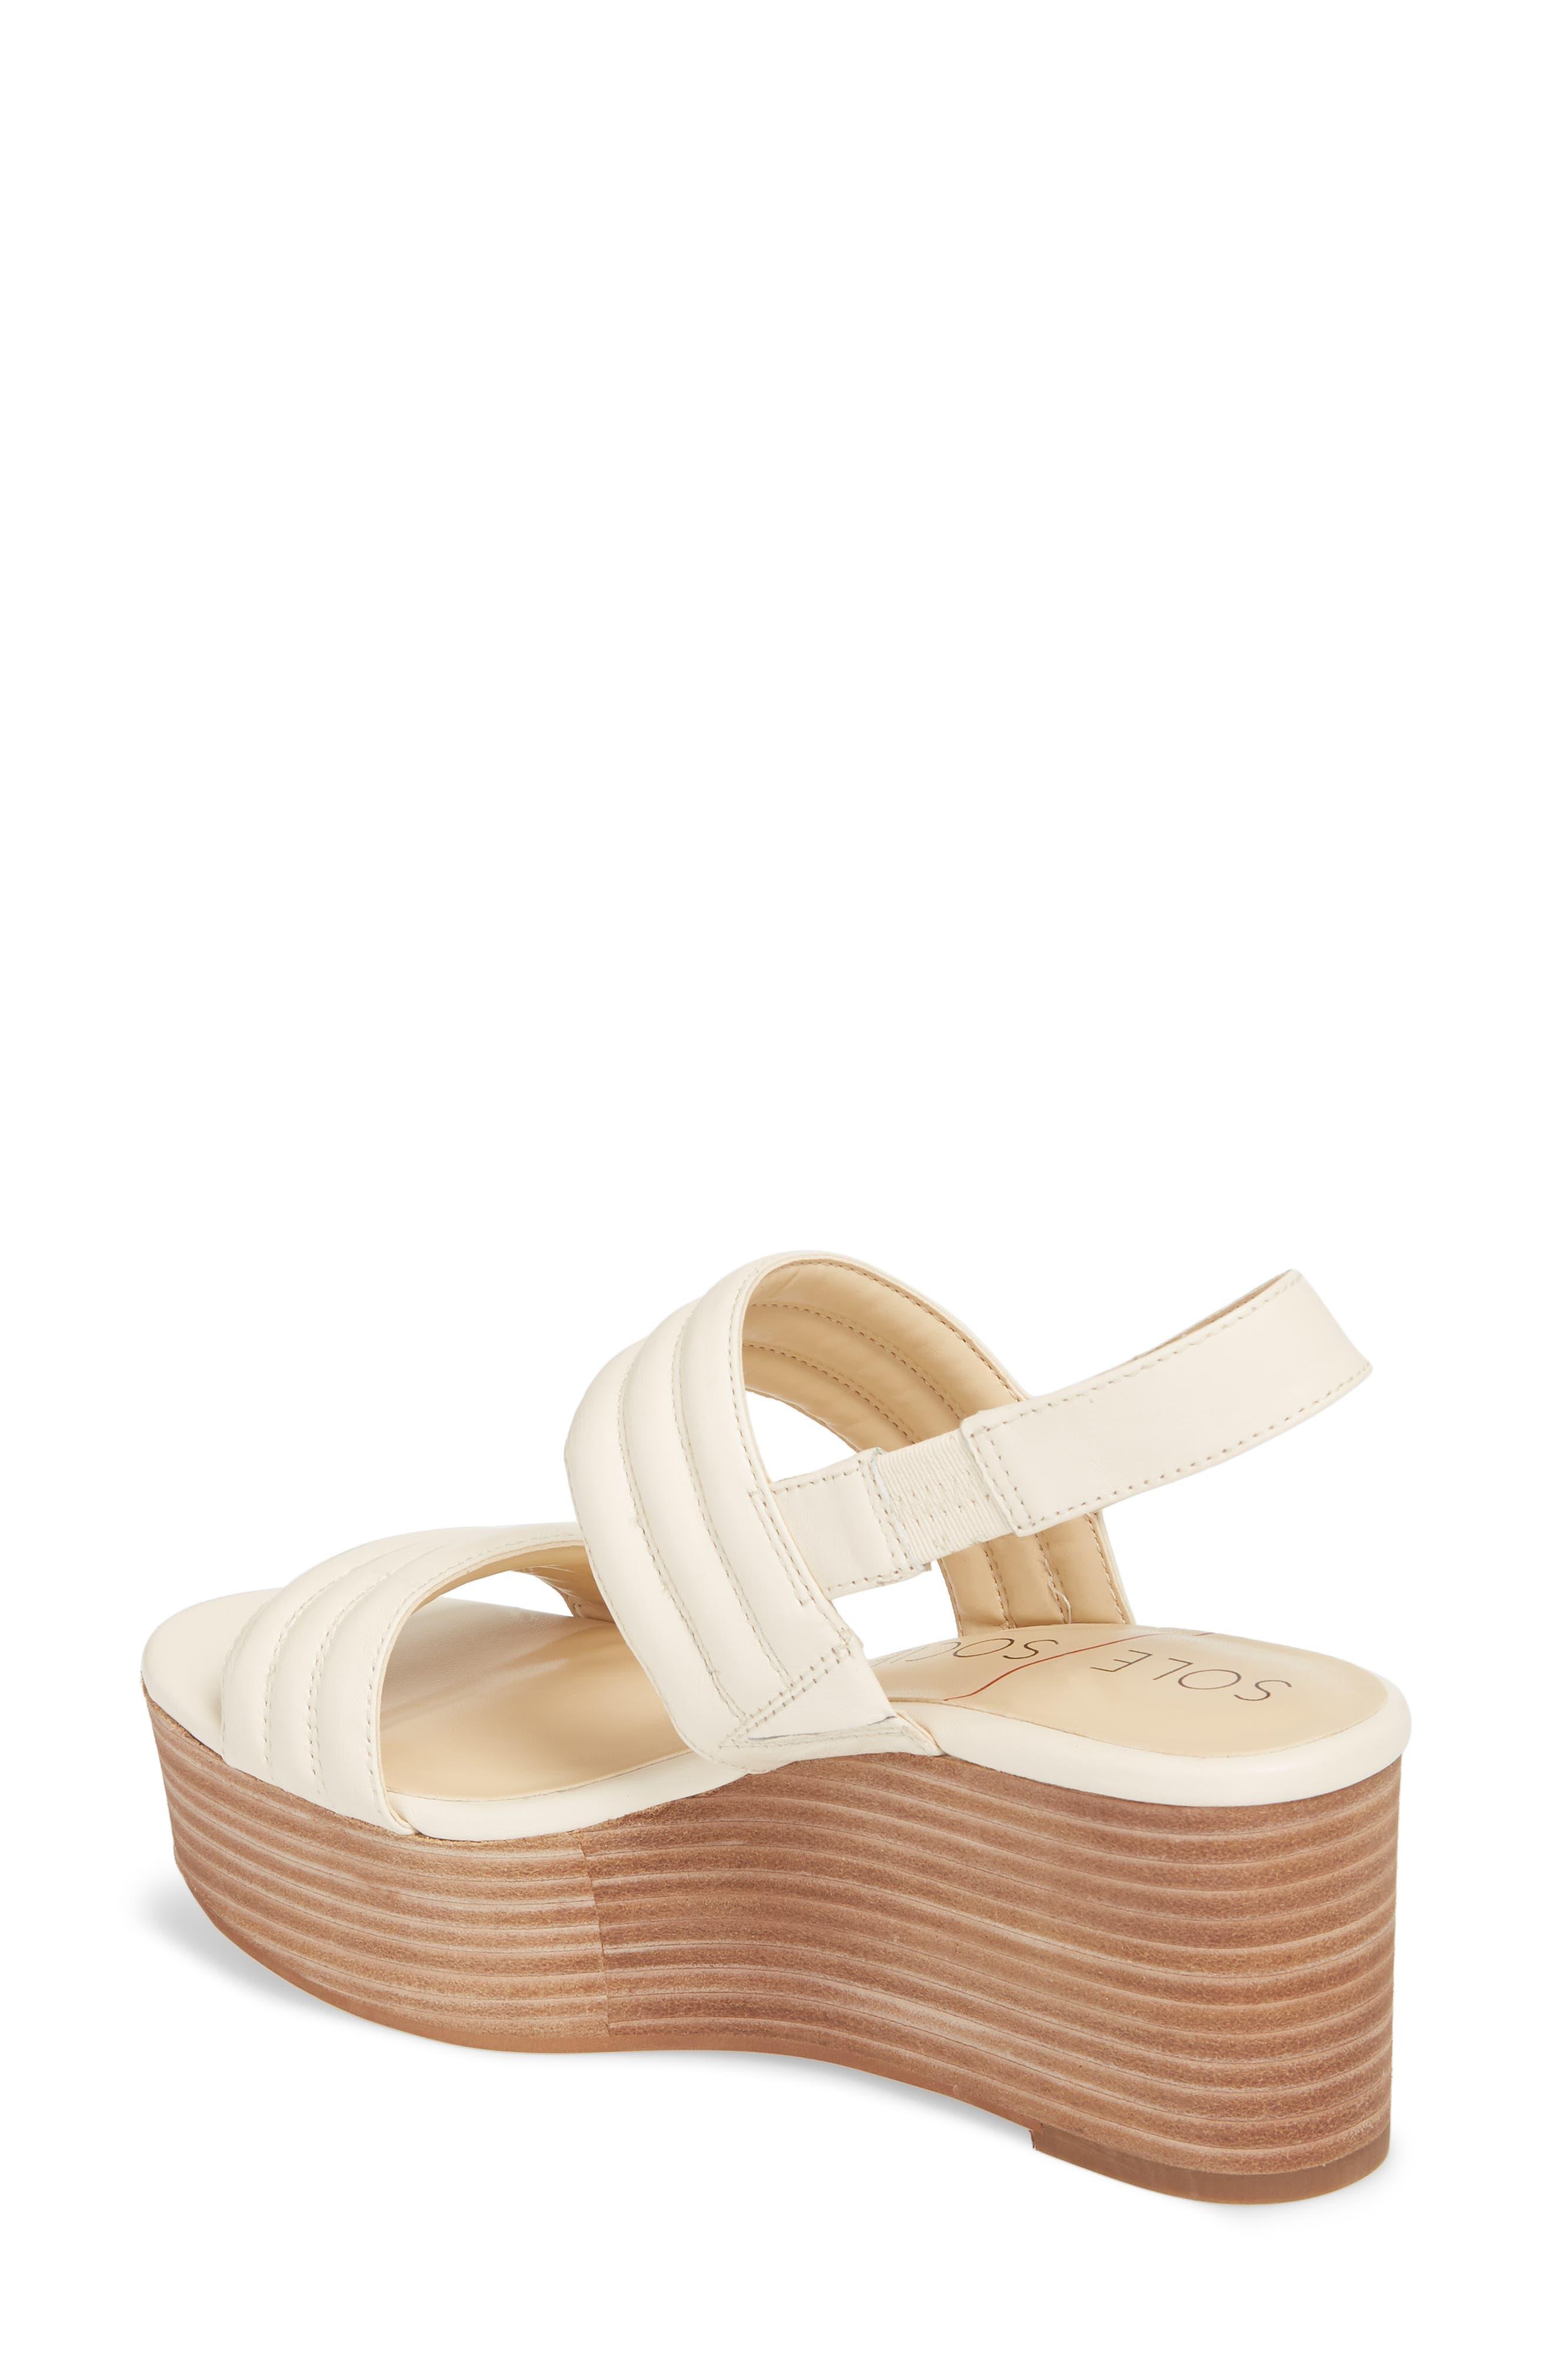 Amberly Platform Sandal,                             Alternate thumbnail 7, color,